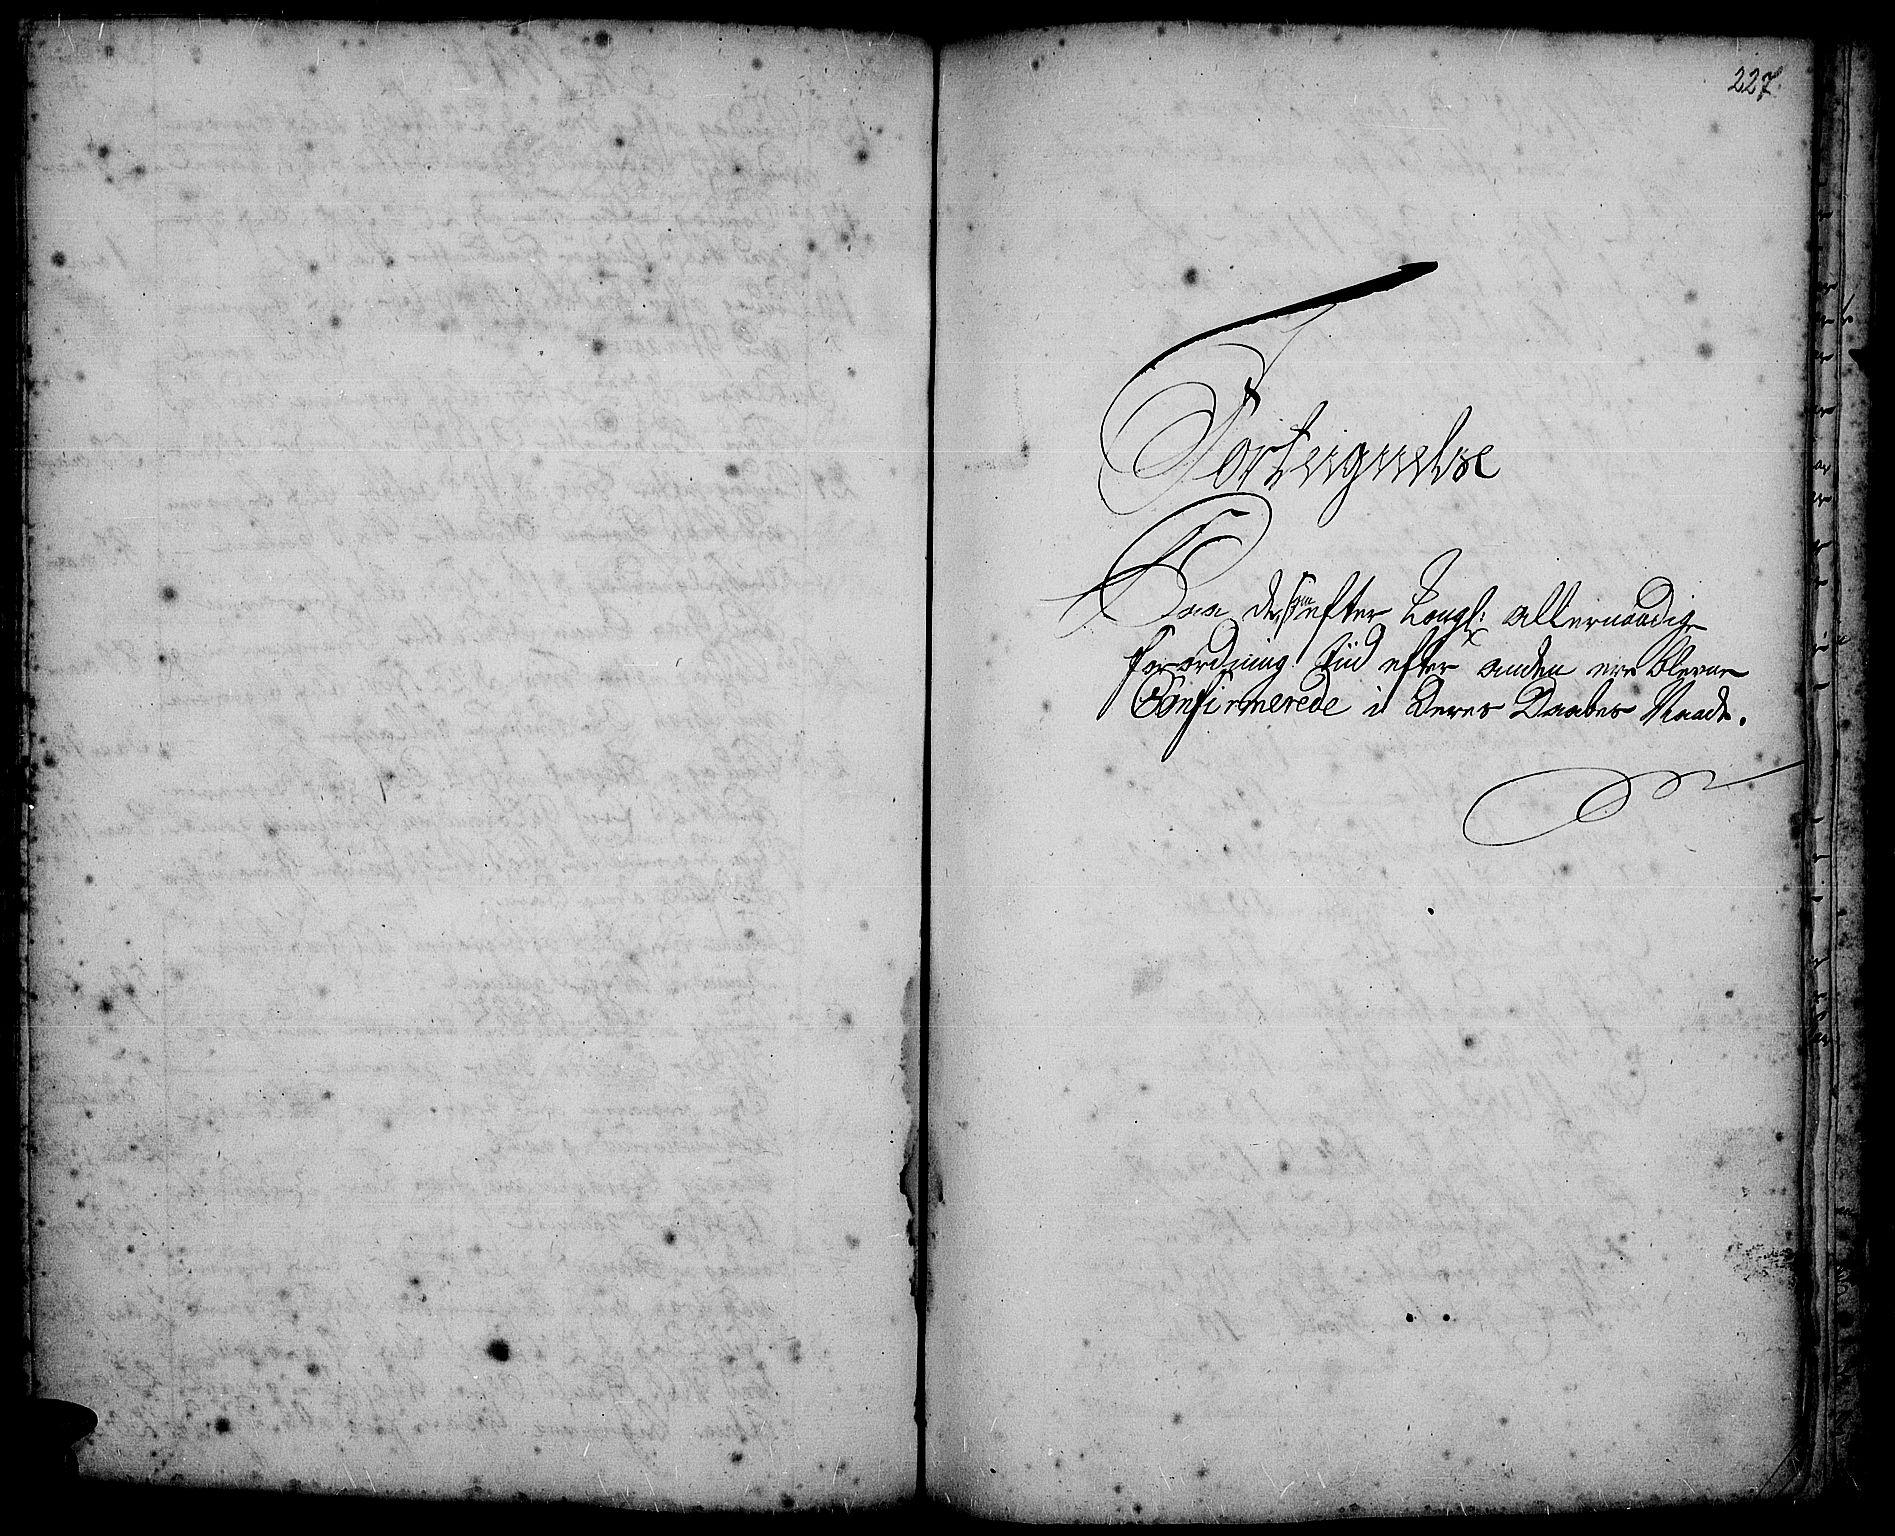 SAH, Gran prestekontor, Ministerialbok nr. 2, 1732-1744, s. 227